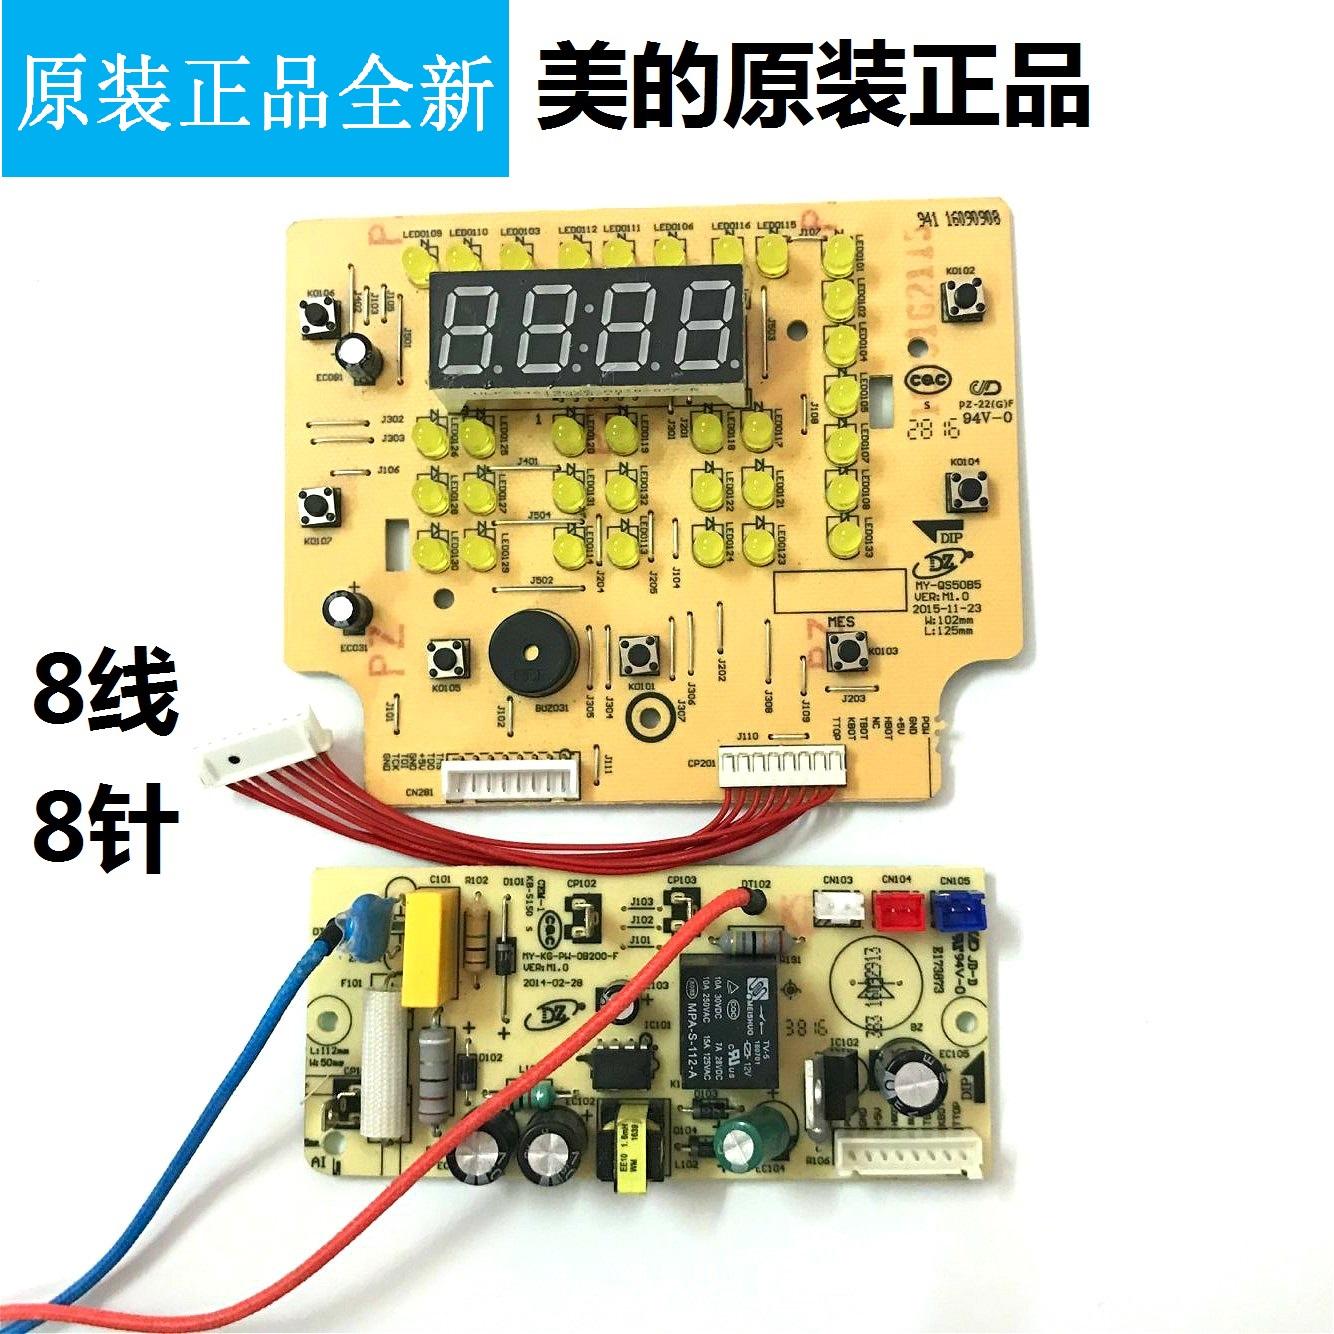 Usd 1247 Midea Electric Pressure Cooker My Qs50b5 Wqs50b5 Circuit Motherboard Power Board Key Set